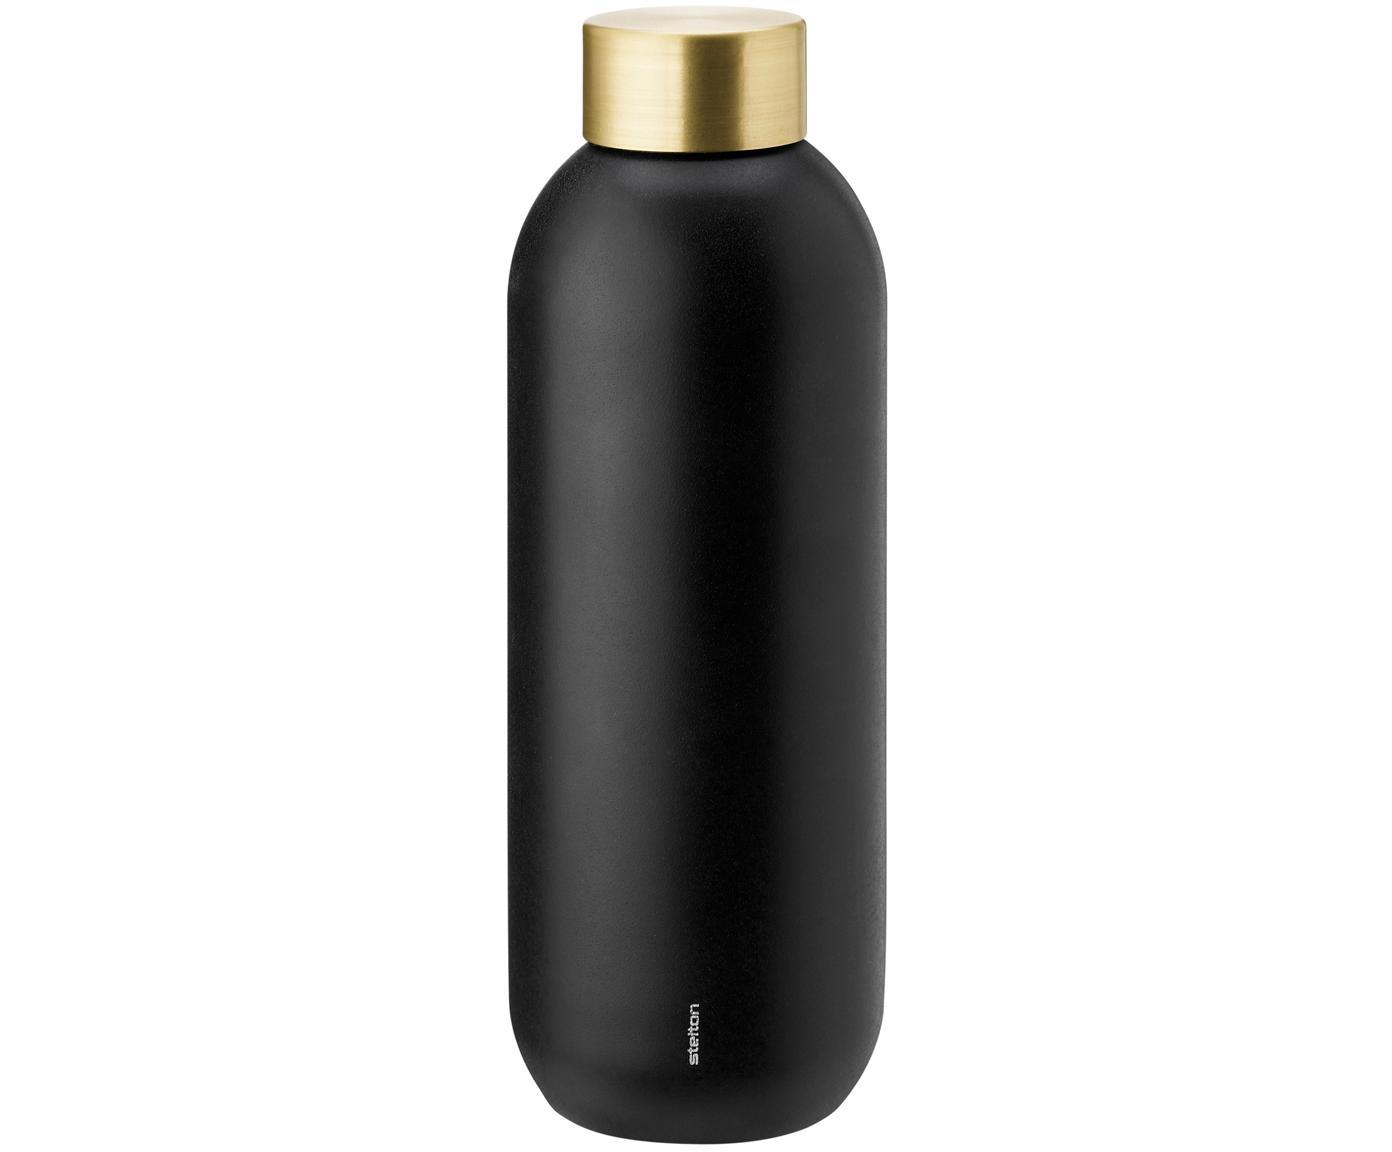 Drinkfles Collar, Frame: edelstaal met Teflon coat, Frame: mat zwart. Schroefdop: messingkleurig, 750 ml